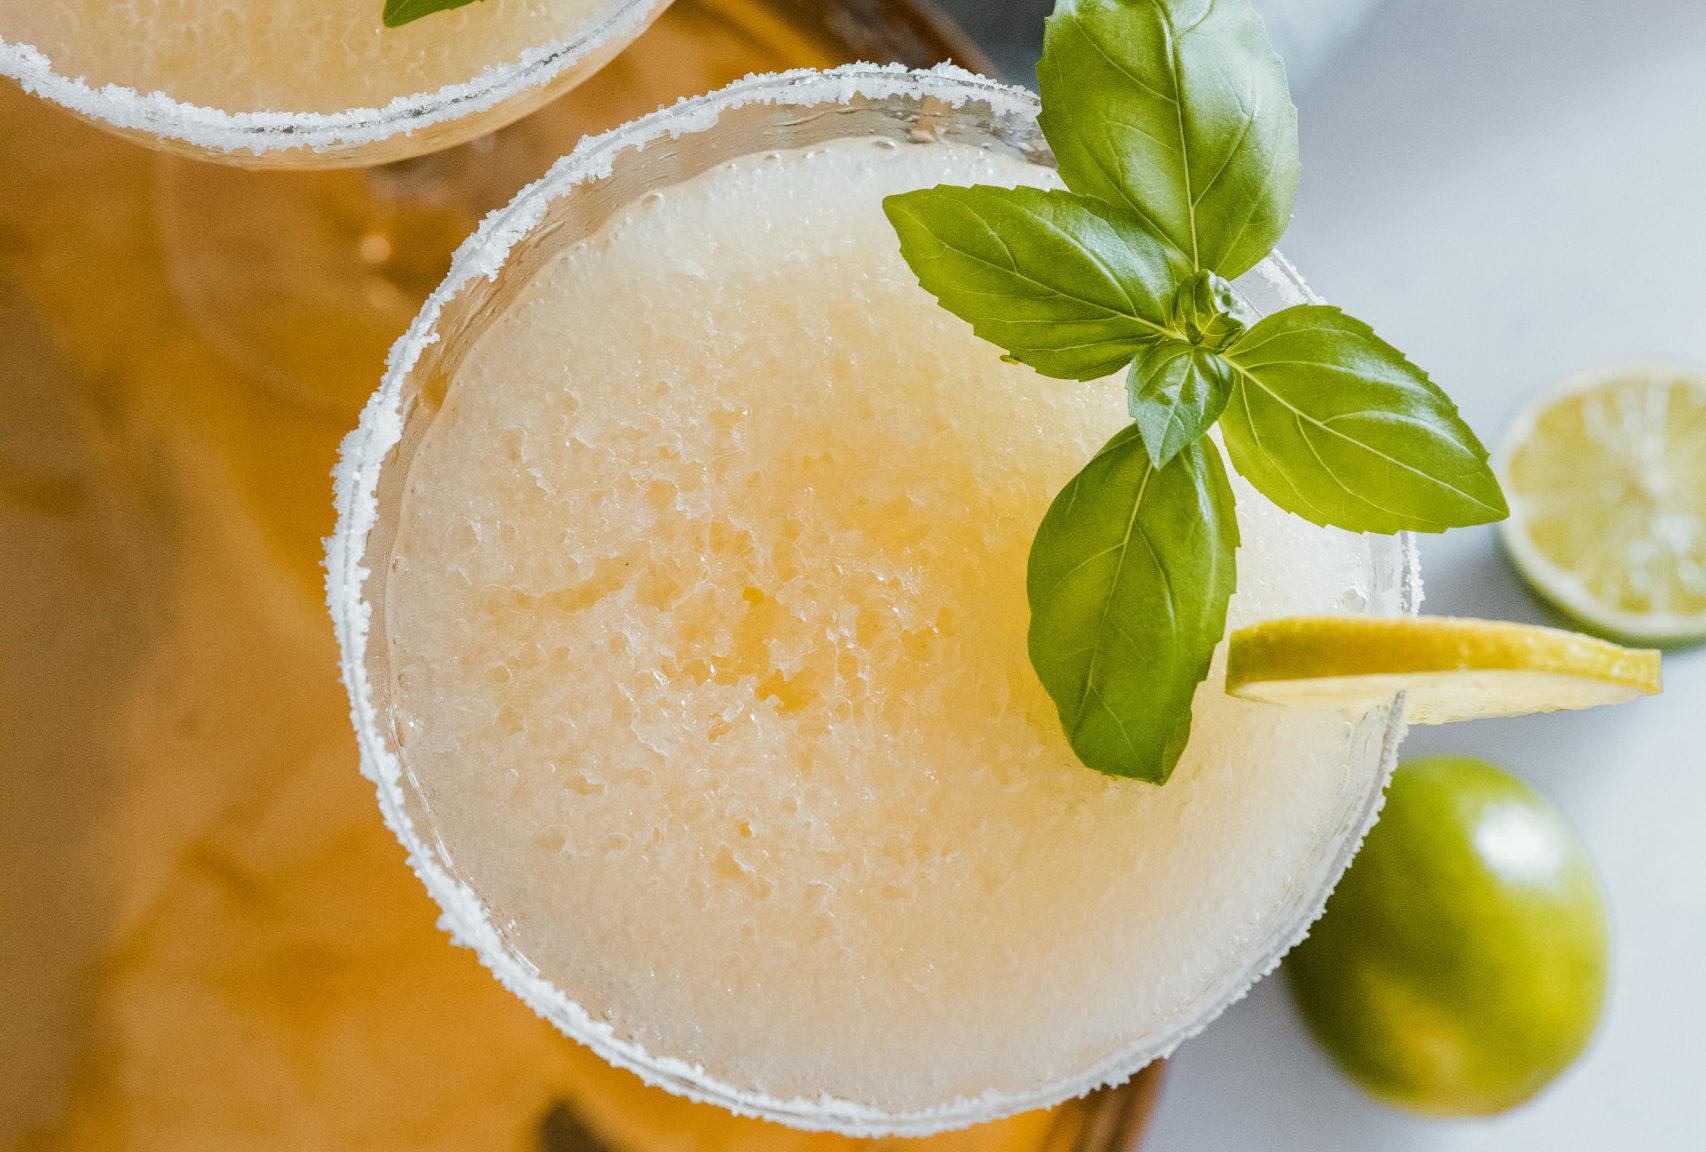 Frozen Orange & Basil Margarita Cocktail Recipe From Dacha Drinks